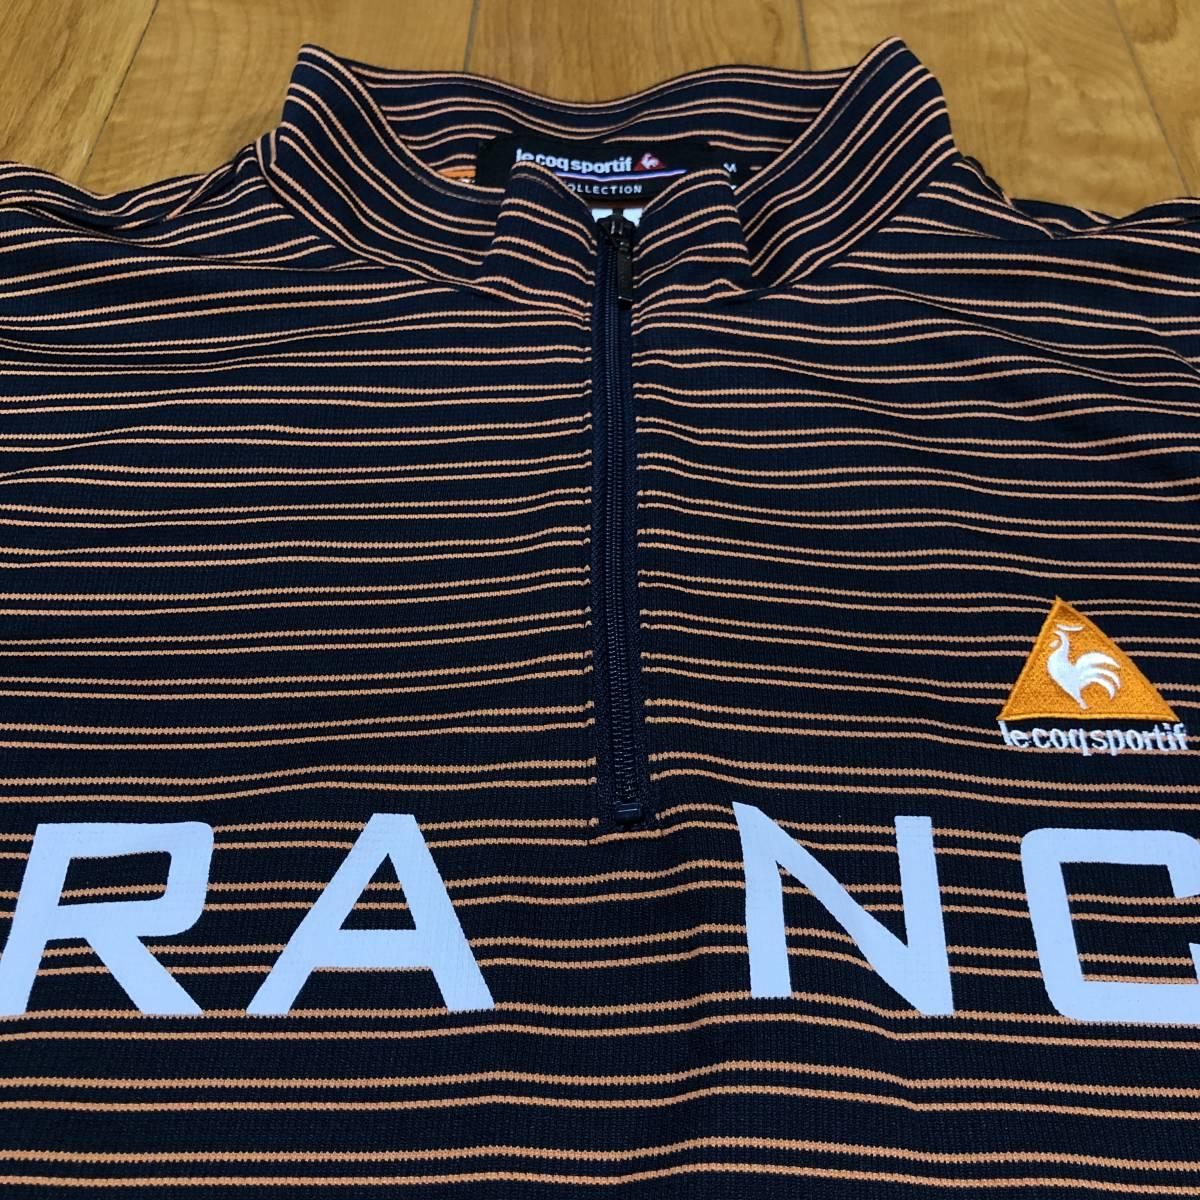 【le coq sportif golf】 ルコック ゴルフ ゴルフウェア 半袖 ハーフジップ ポロシャツ メンズ Mサイズ 美品!_画像4